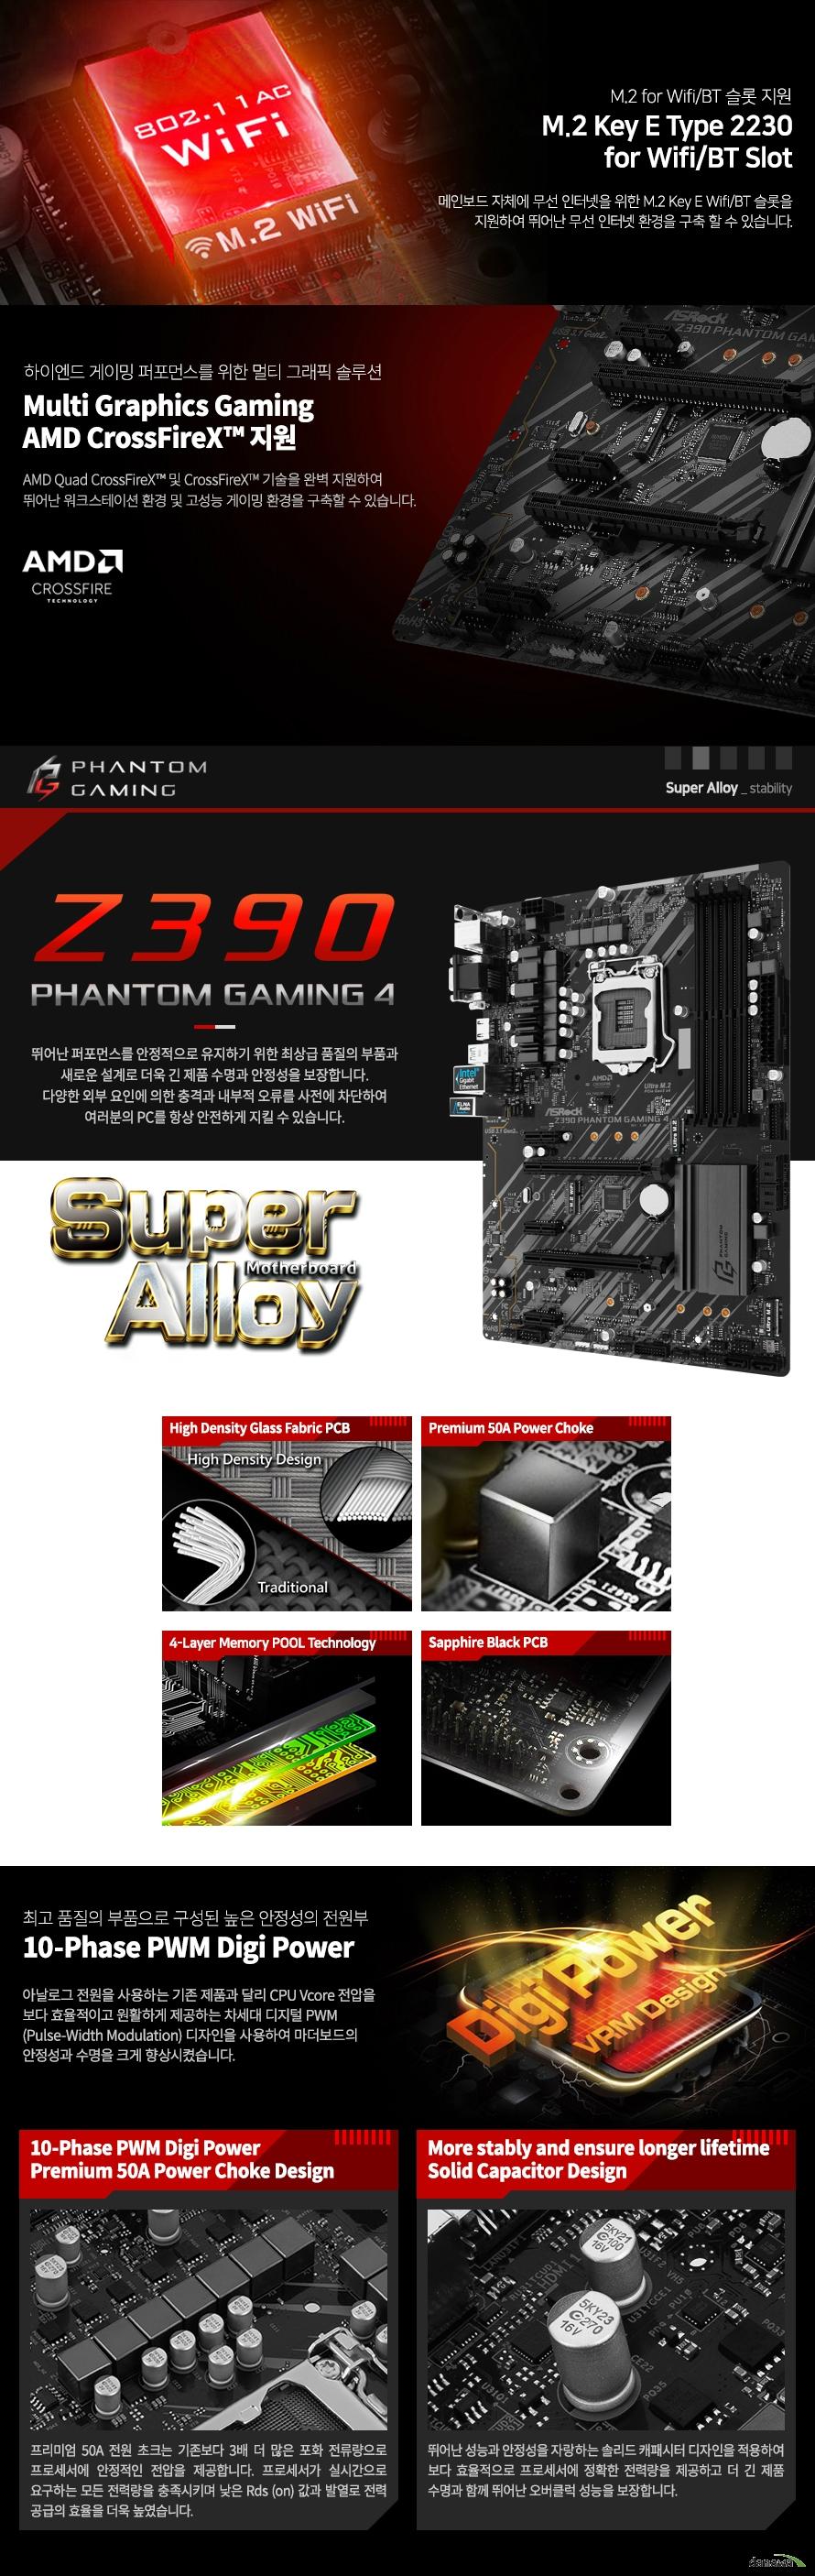 ASRock  Z390 Phantom Gaming 4 에즈윈